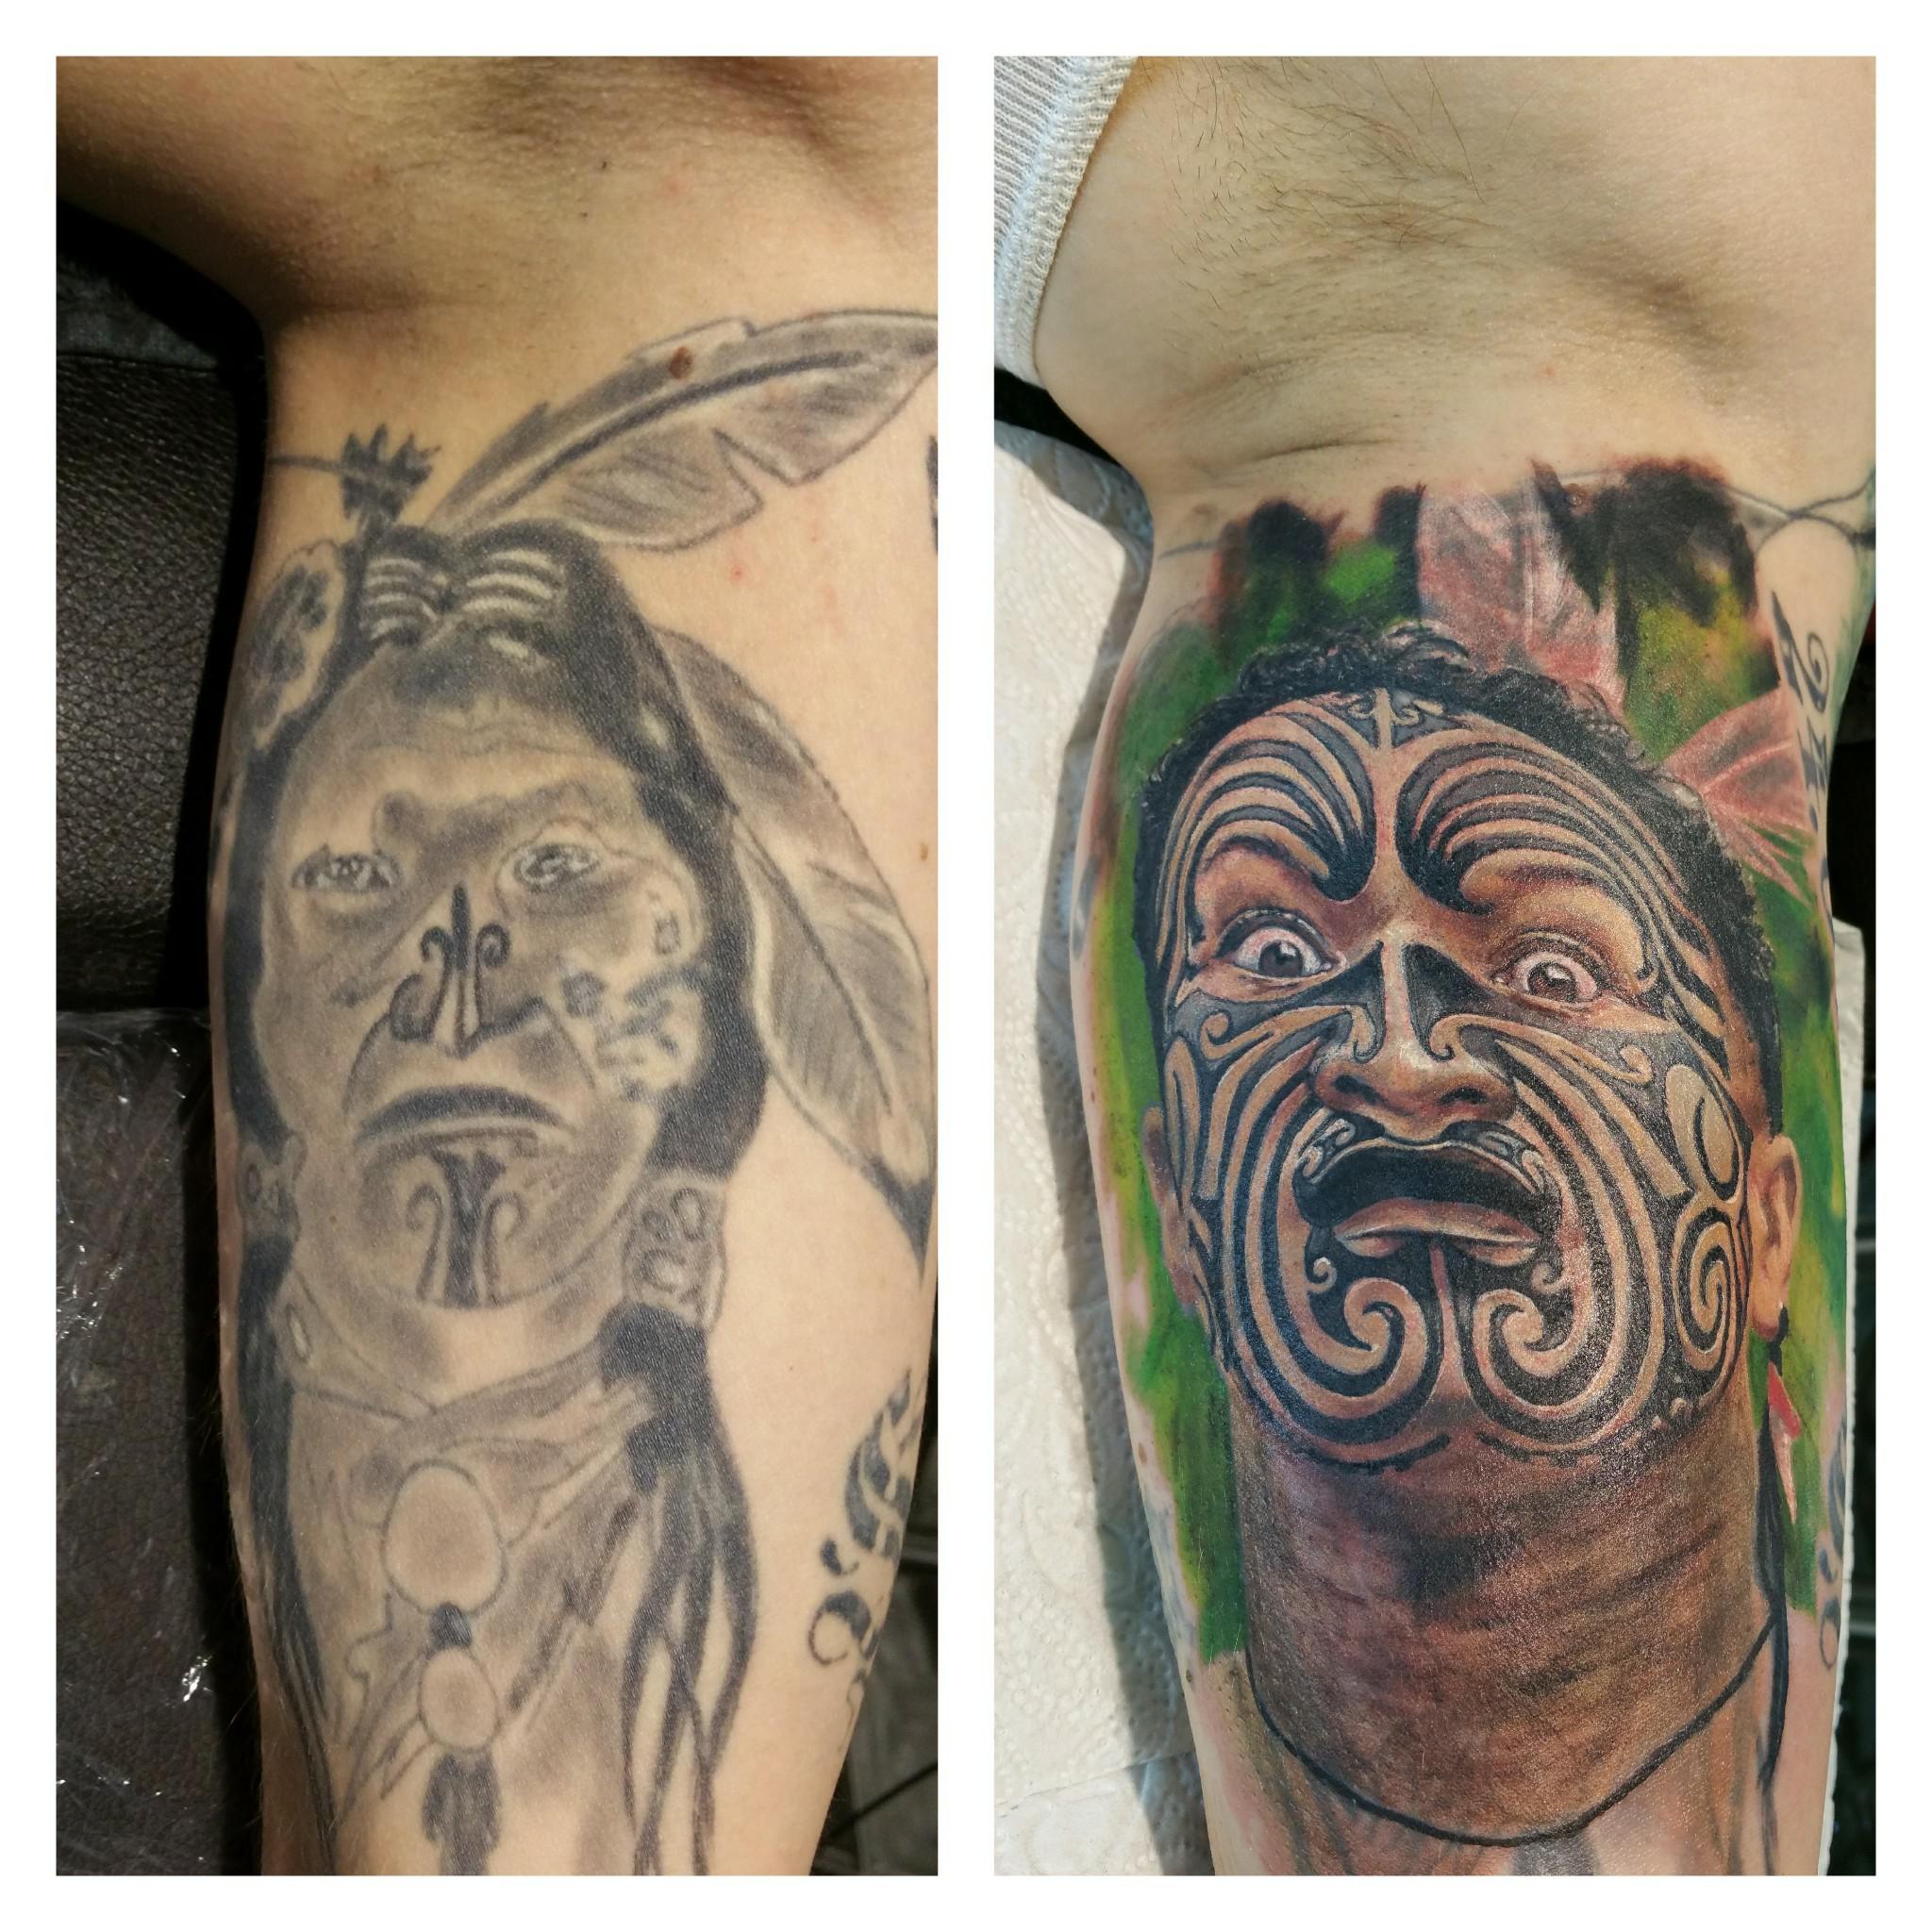 Beste Oberarm Tattoos Tattoo Bewertung De Lass Deine Tattoos